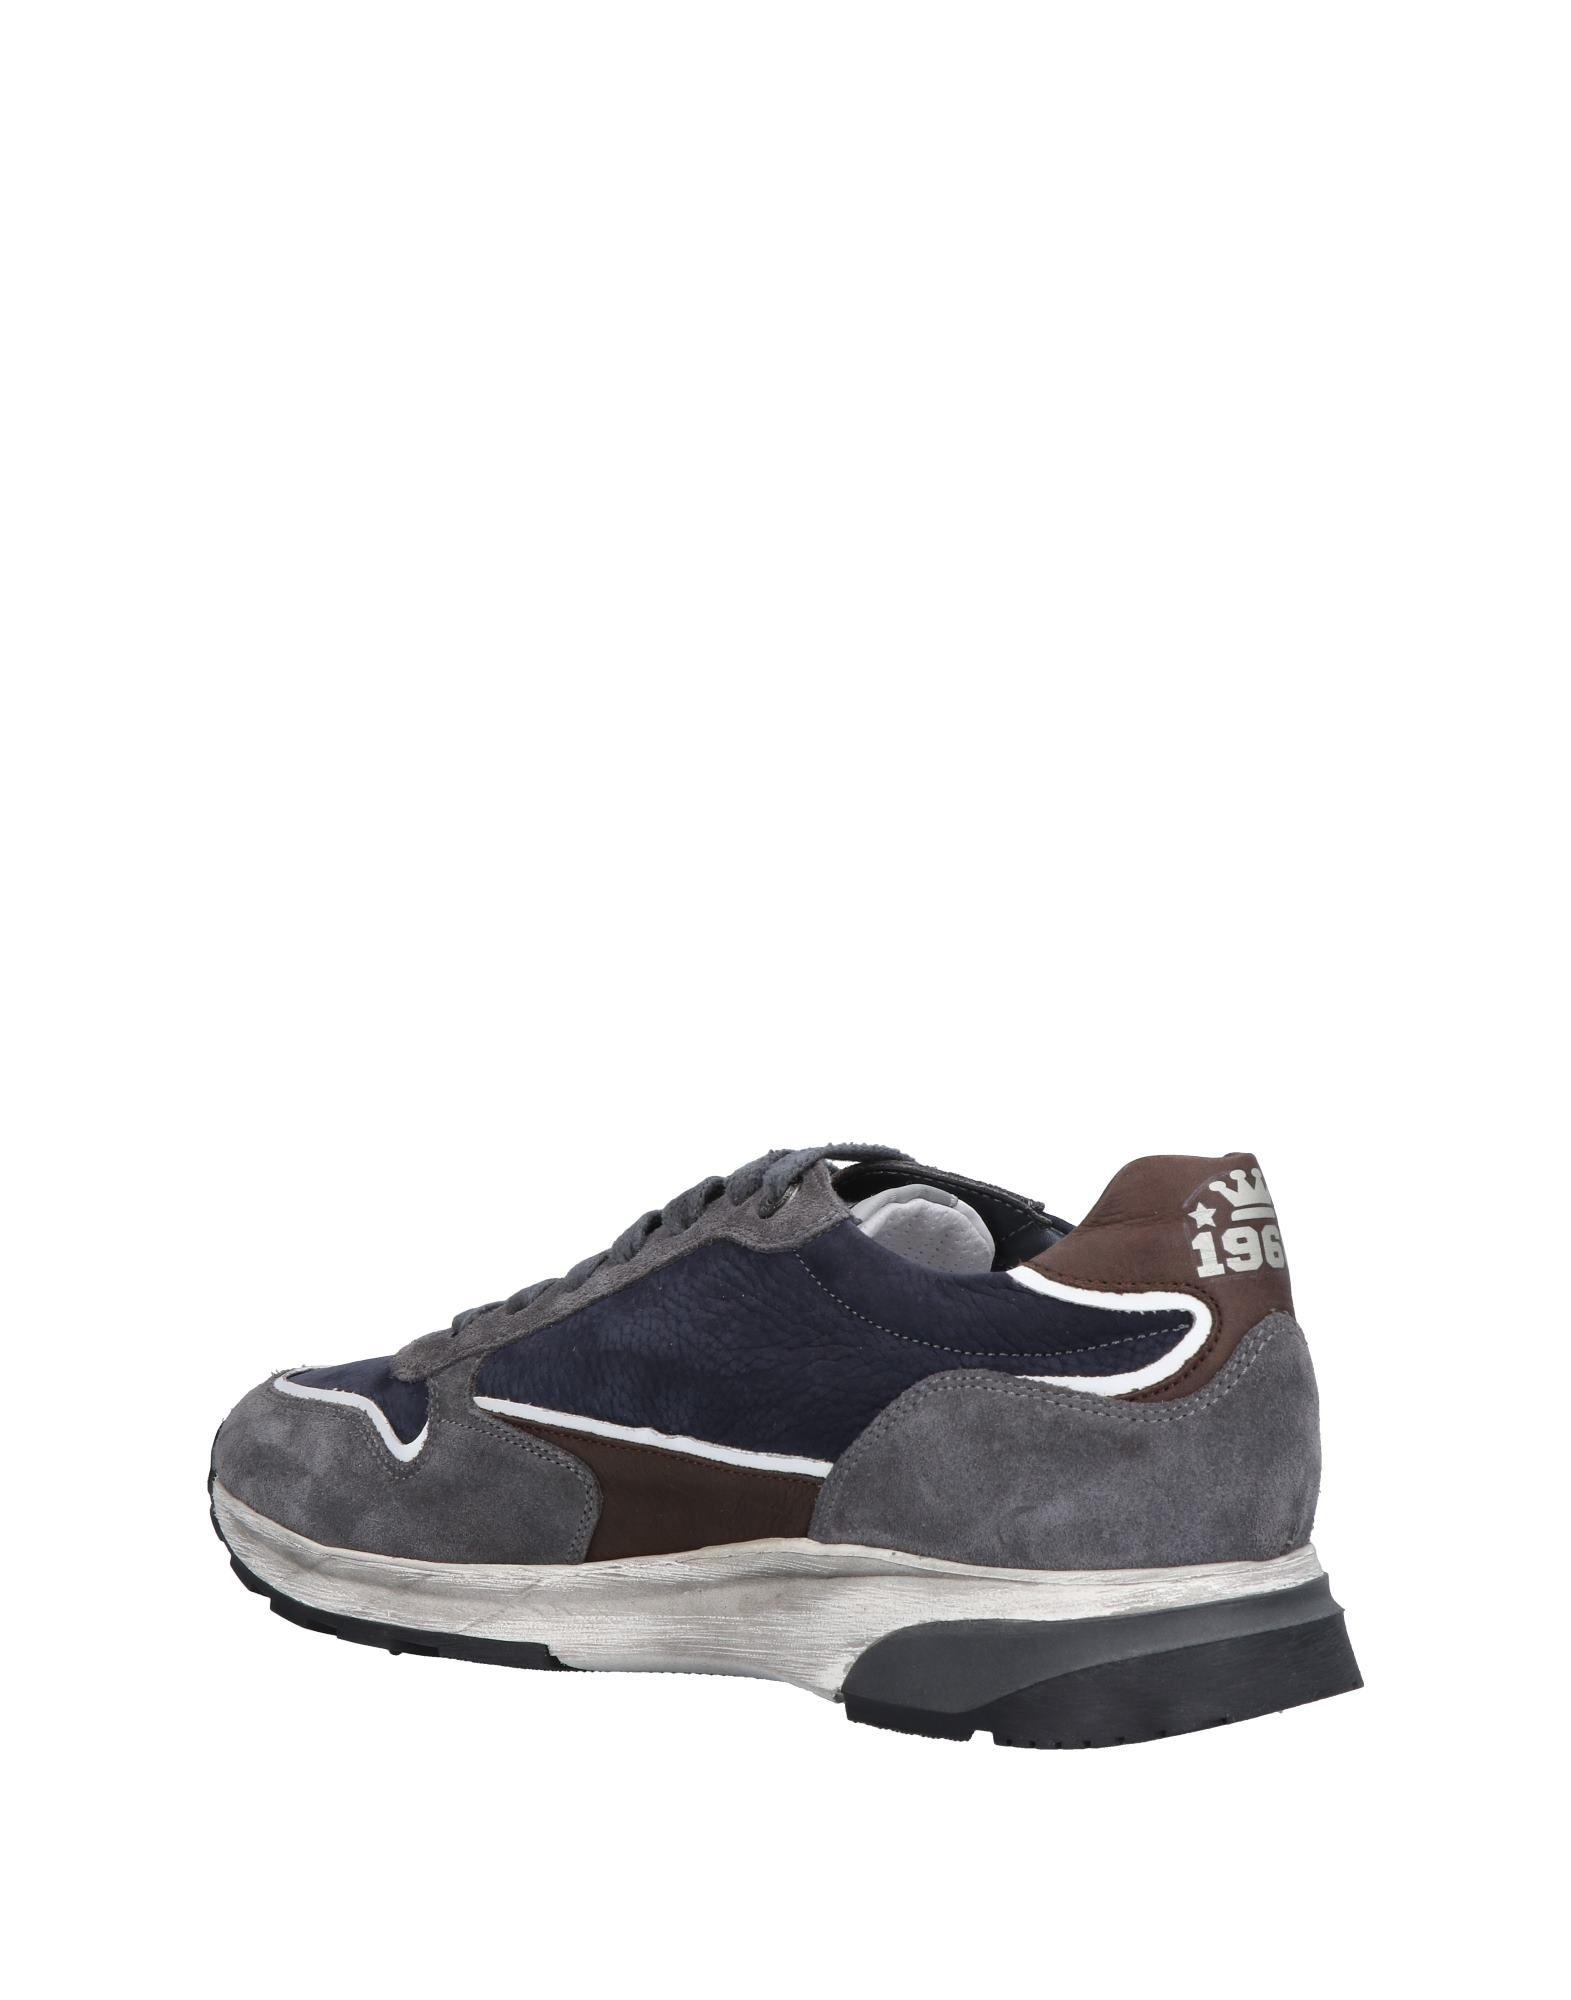 Dico' By Corvari Sneakers 11488039GW Herren  11488039GW Sneakers 961c45